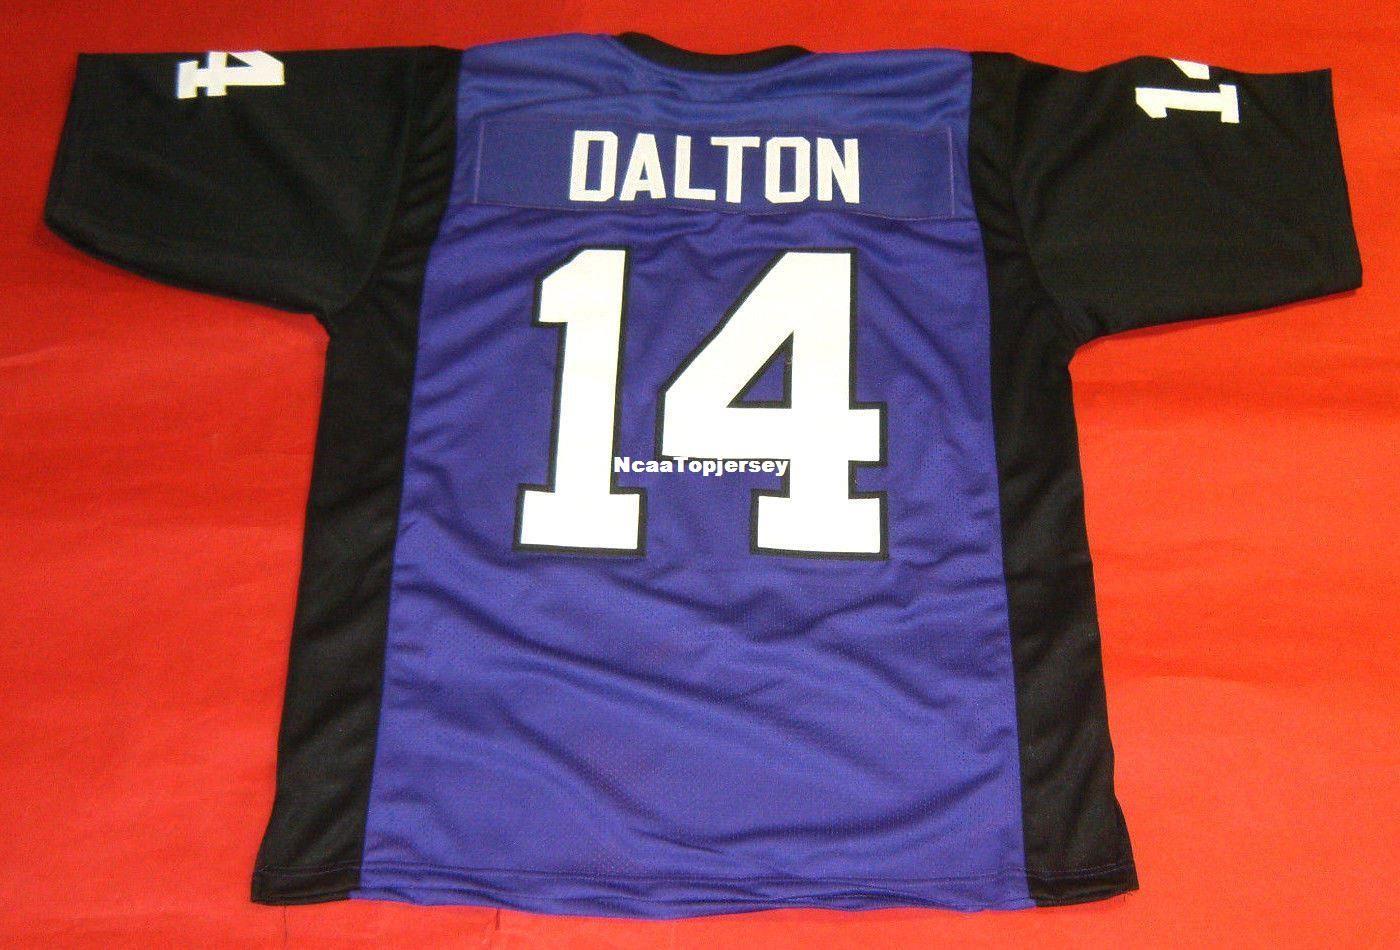 andy dalton tcu jersey